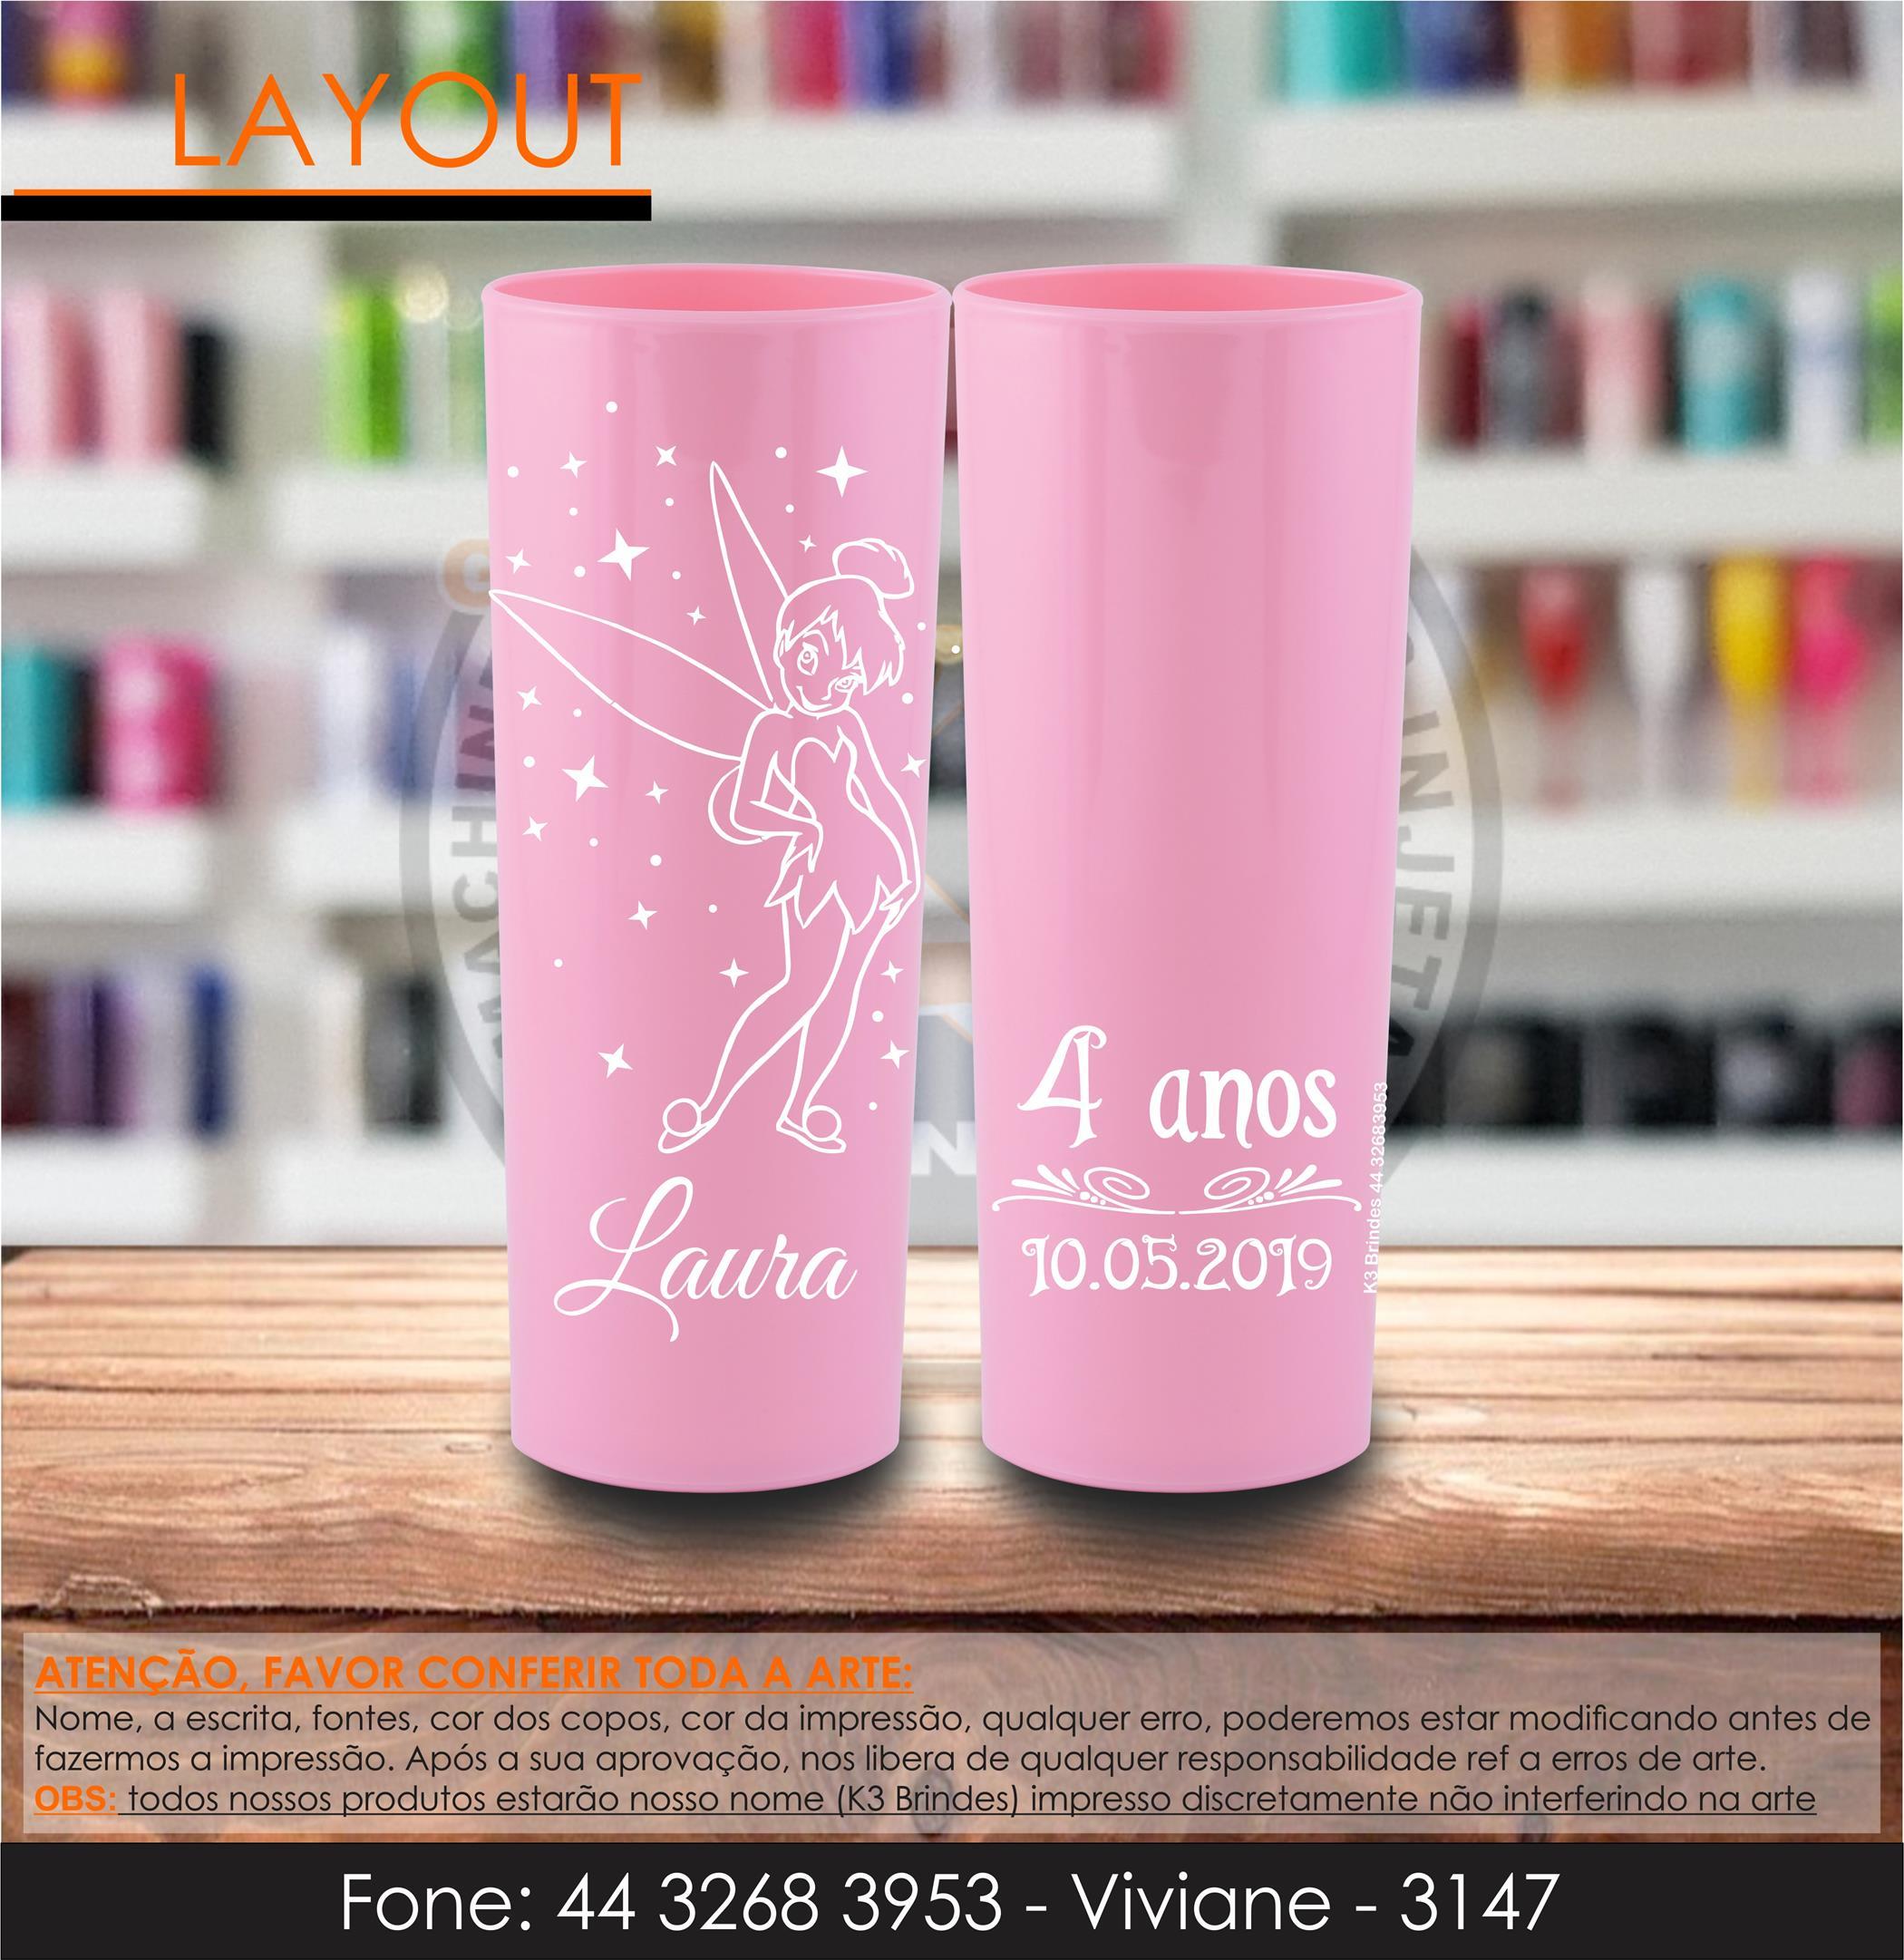 3147 - long drink rosa bebe - tinker beel - sininho - petter pan - 4 anos - infantil